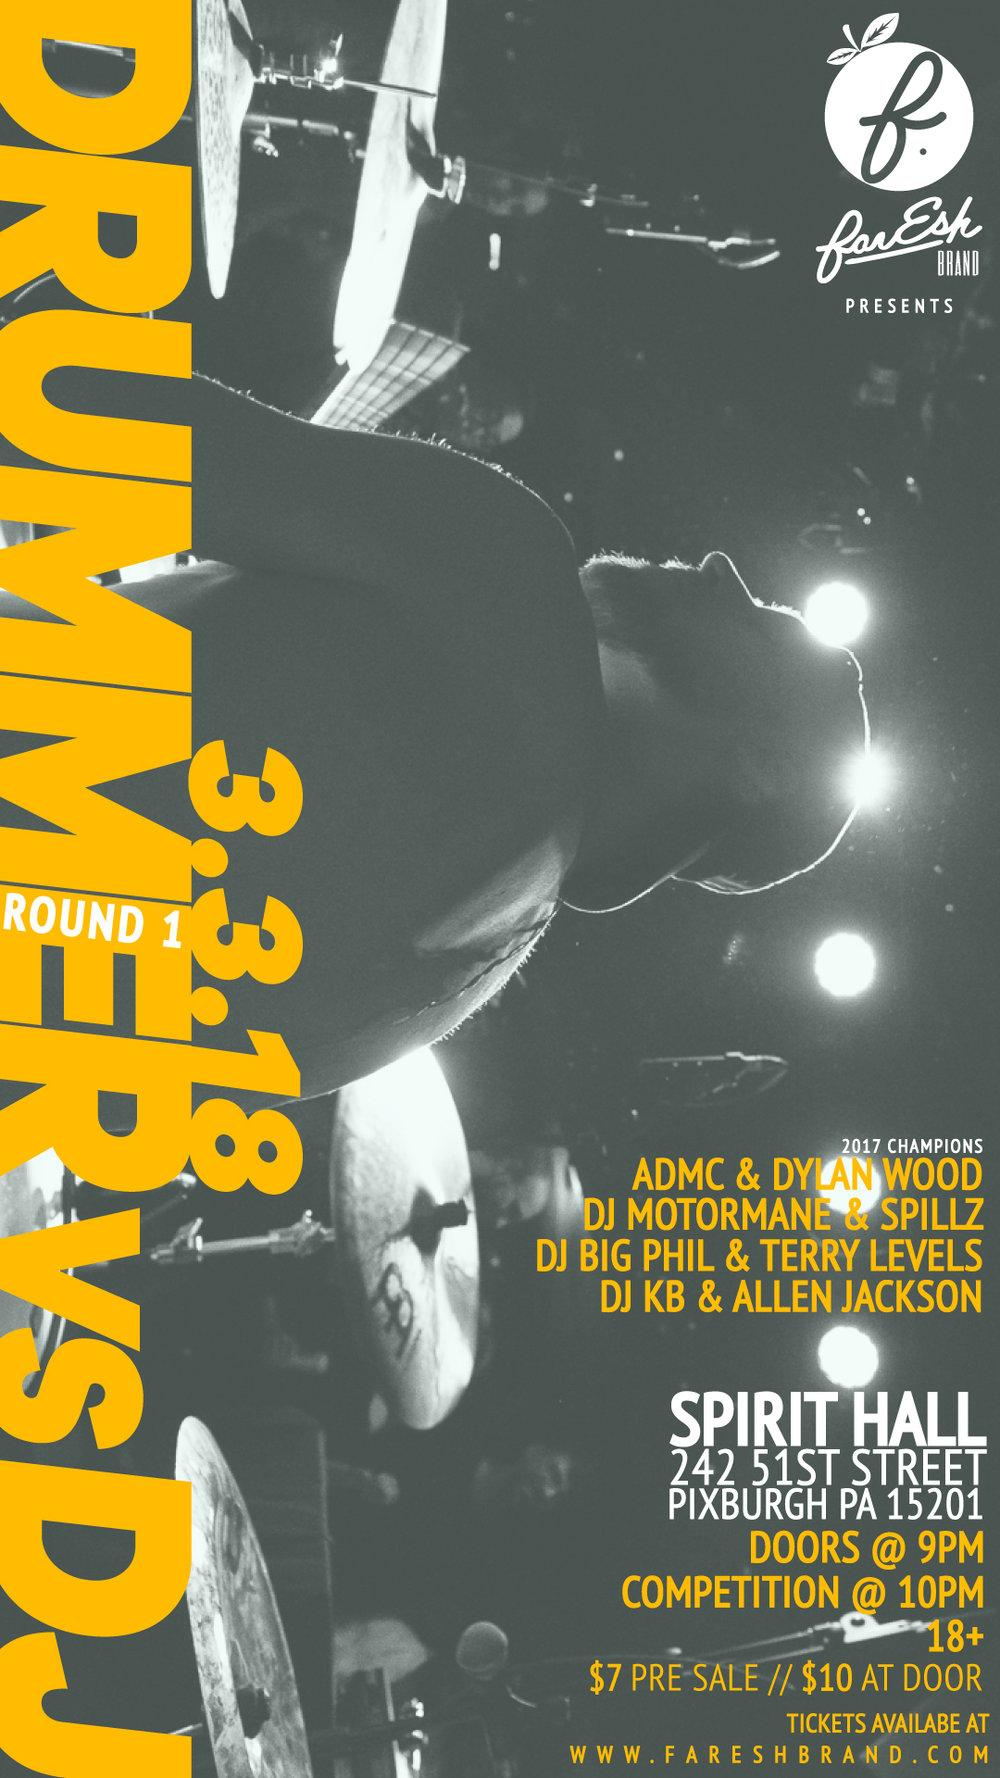 Drummer-vs-DJ-March-2018-IG-Story-Flyer.jpg